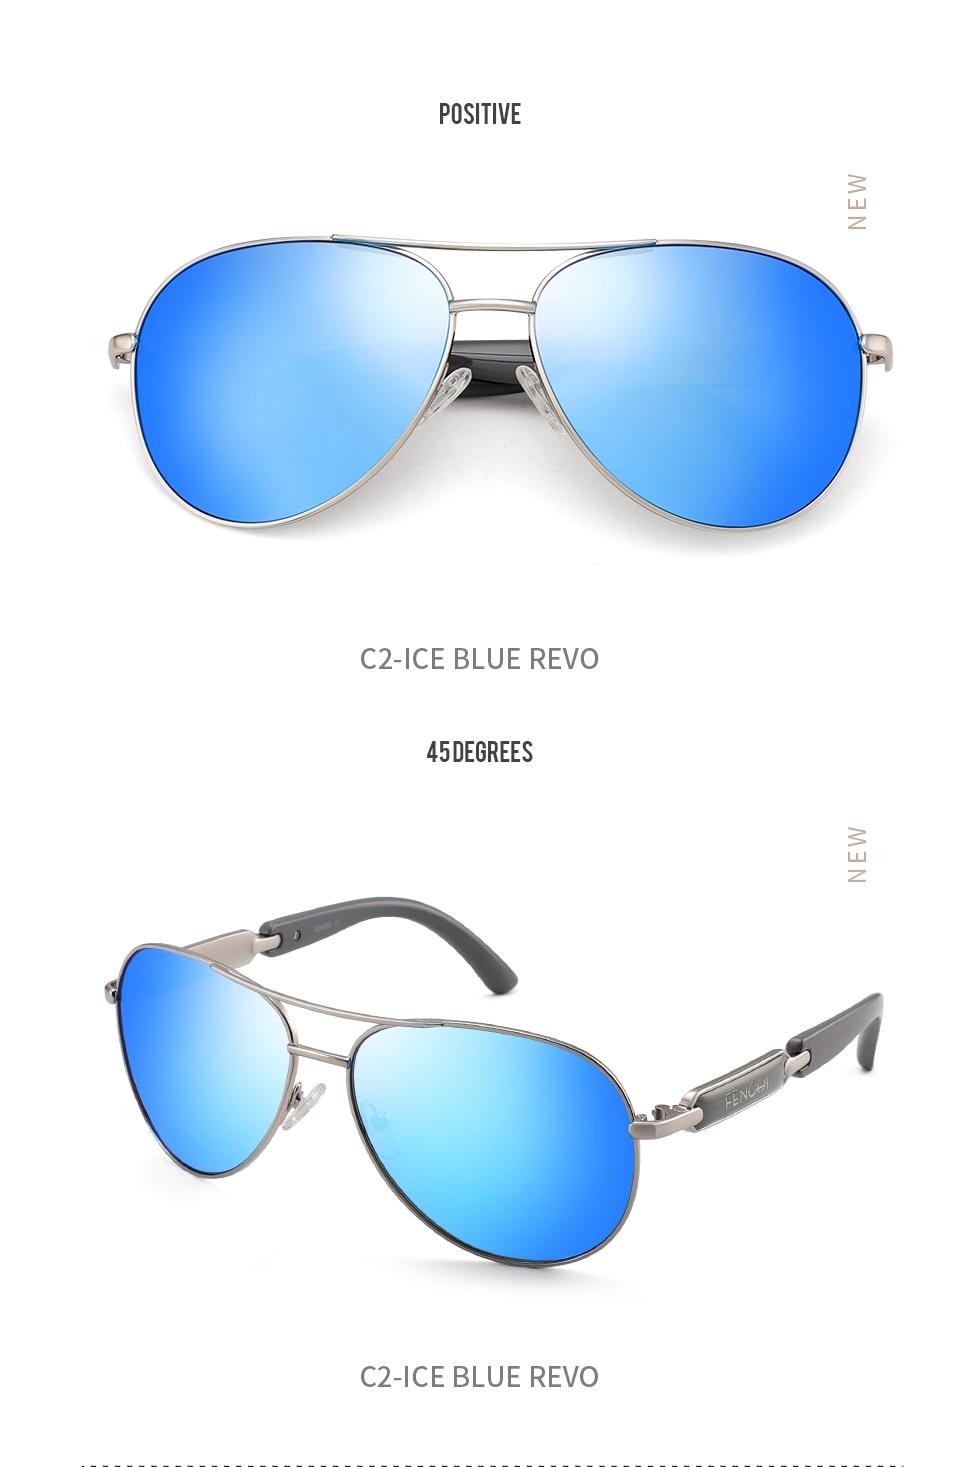 H14c93a18536d426e9ba6ecdf7a449df3F FENCHI Polarized Sunglasses Women Vintage Brand Glasses Driving Pilot Pink Mirror sunglasses Men ladies oculos de sol feminino